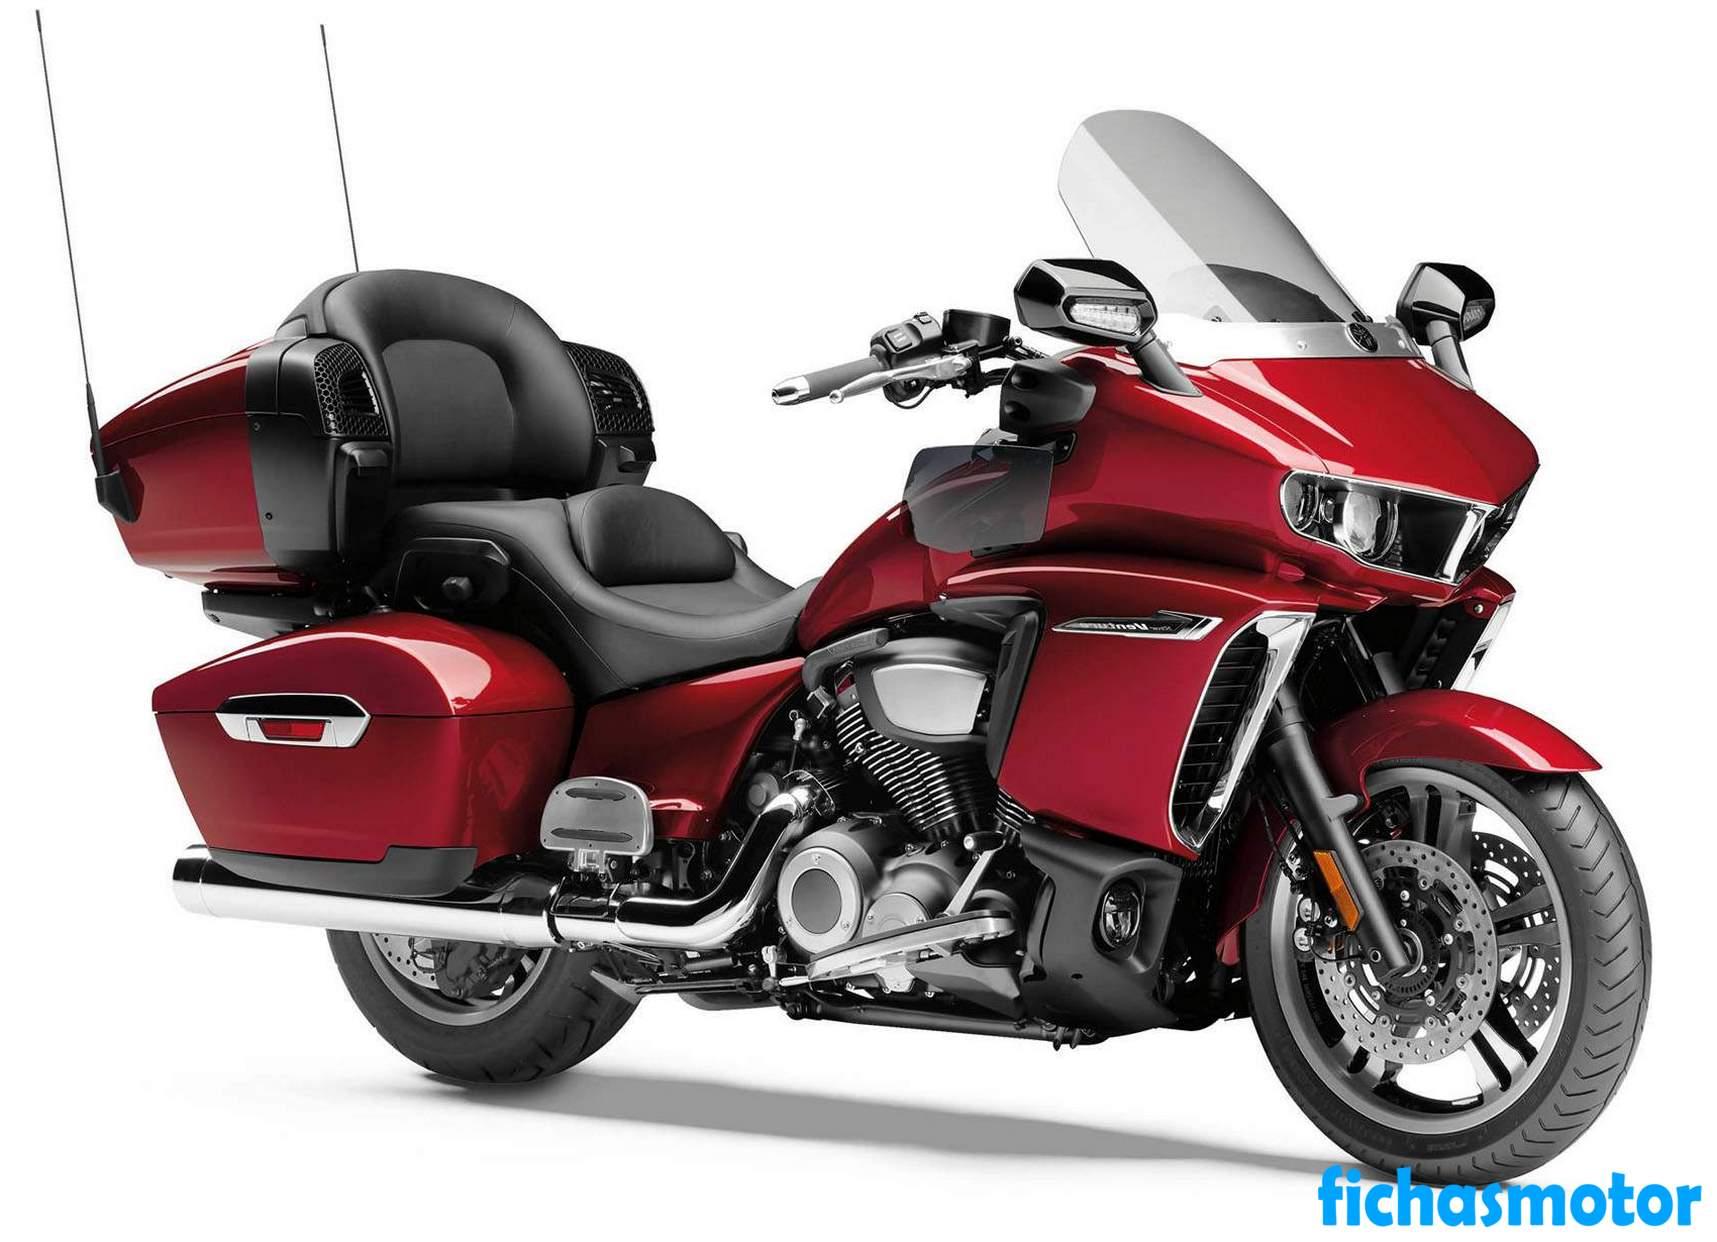 Ficha técnica Yamaha Star Venture 2020